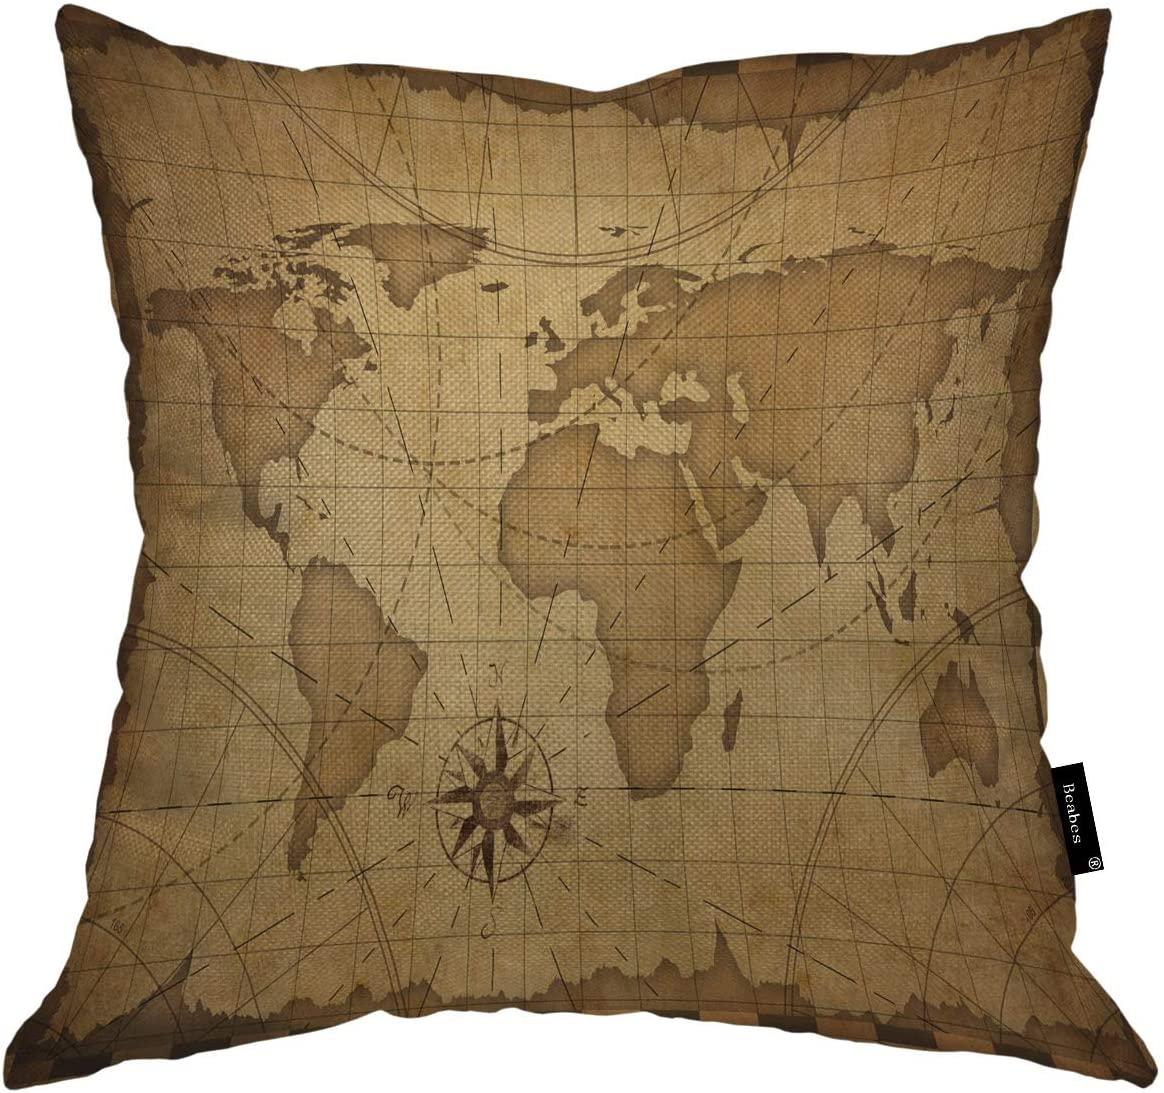 Beabes World Map Throw Pillowcase Retro Old Nautical Vintage World Map Theme Sea Adventure Circle Cross Square Throw Pillow Cover for Men Women Boys Girls Home Decor Cotton Linen 18x18 Inch